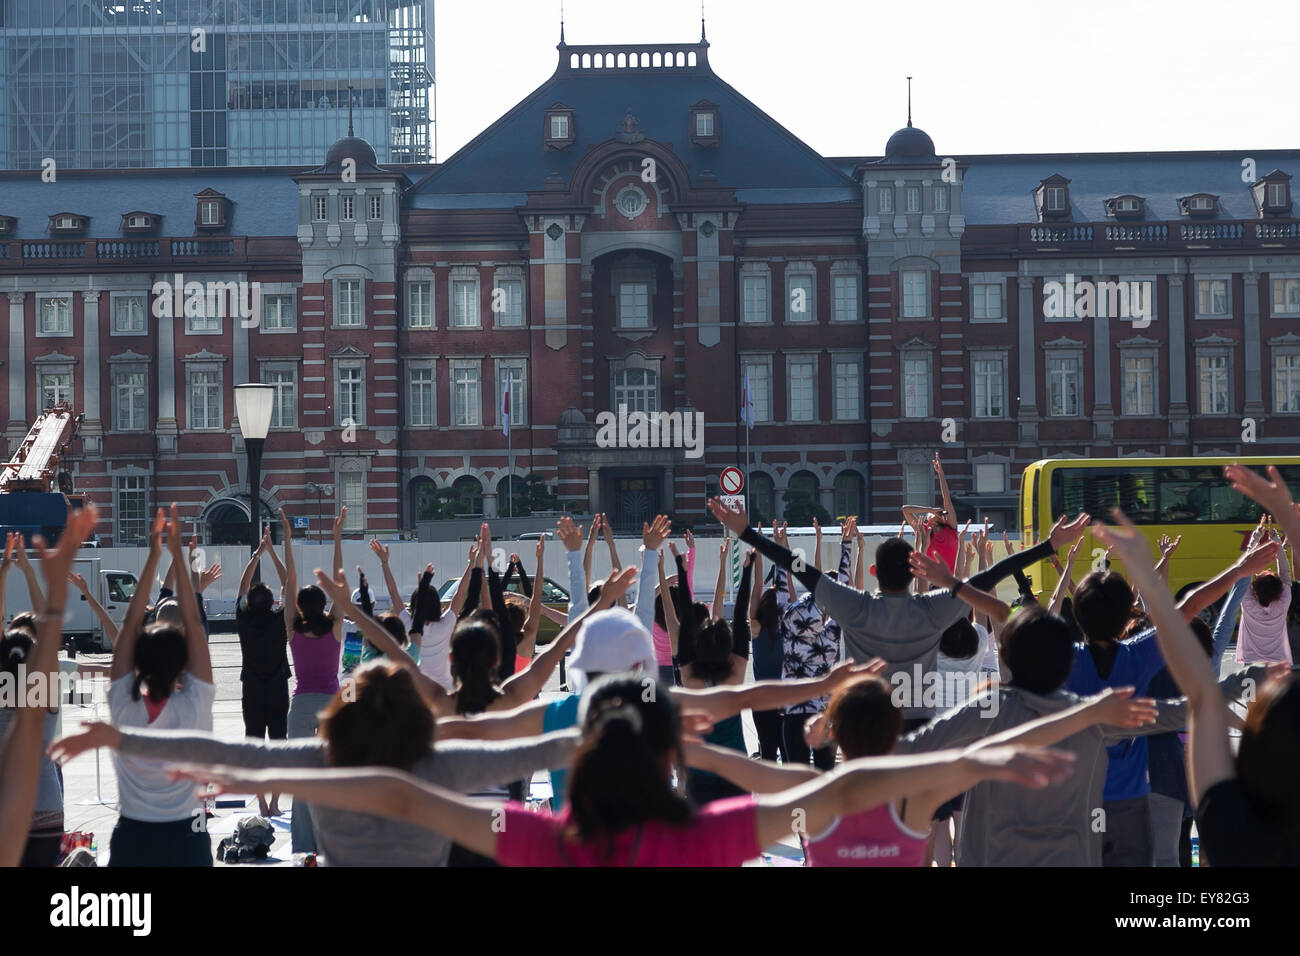 Ufficio Open Space Yoga : Open space tokyo immagini & open space tokyo fotos stock alamy